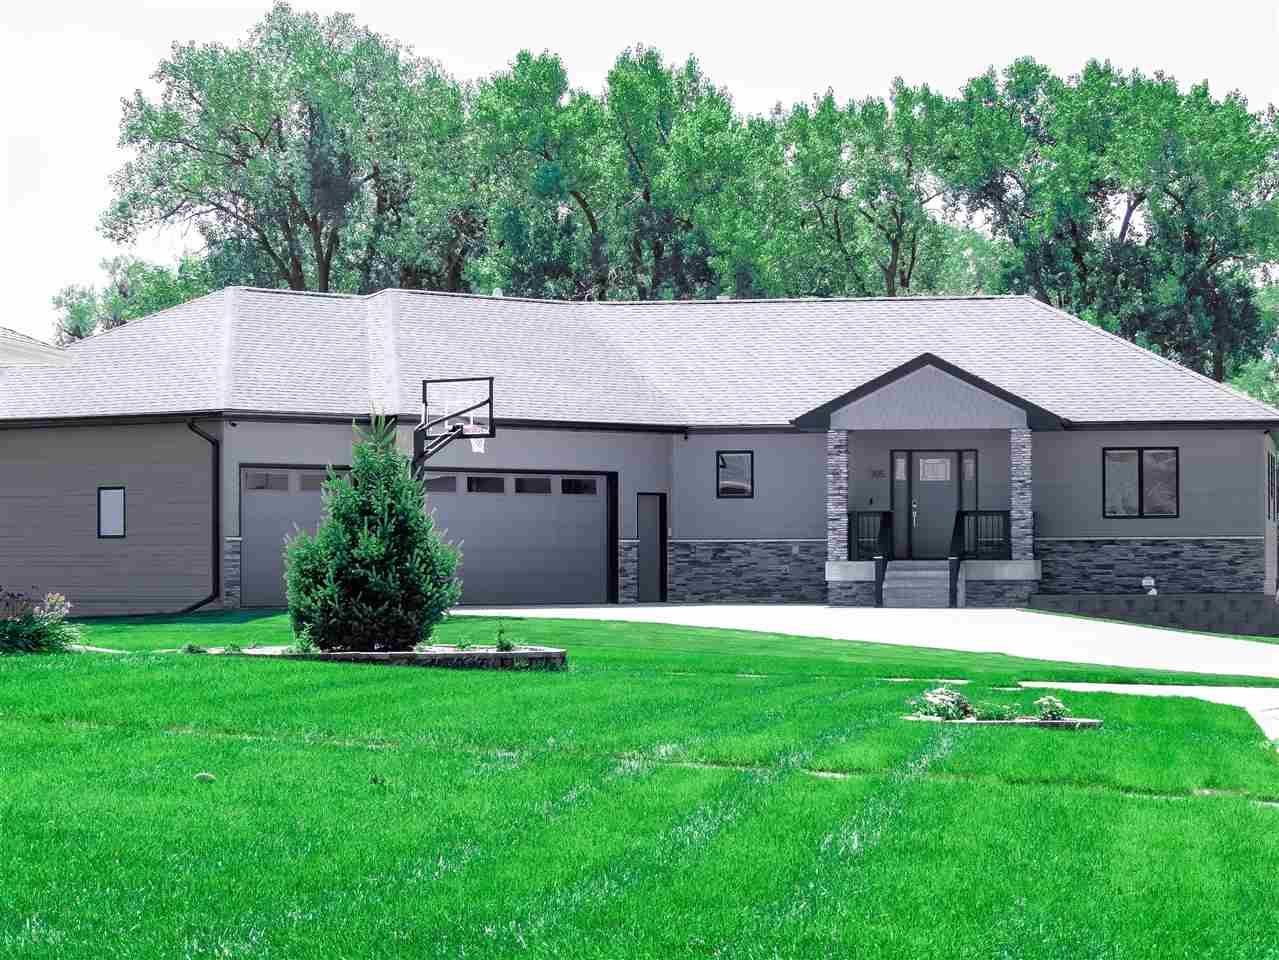 705 Zimmerman Drive, Battle Creek, NE 68715